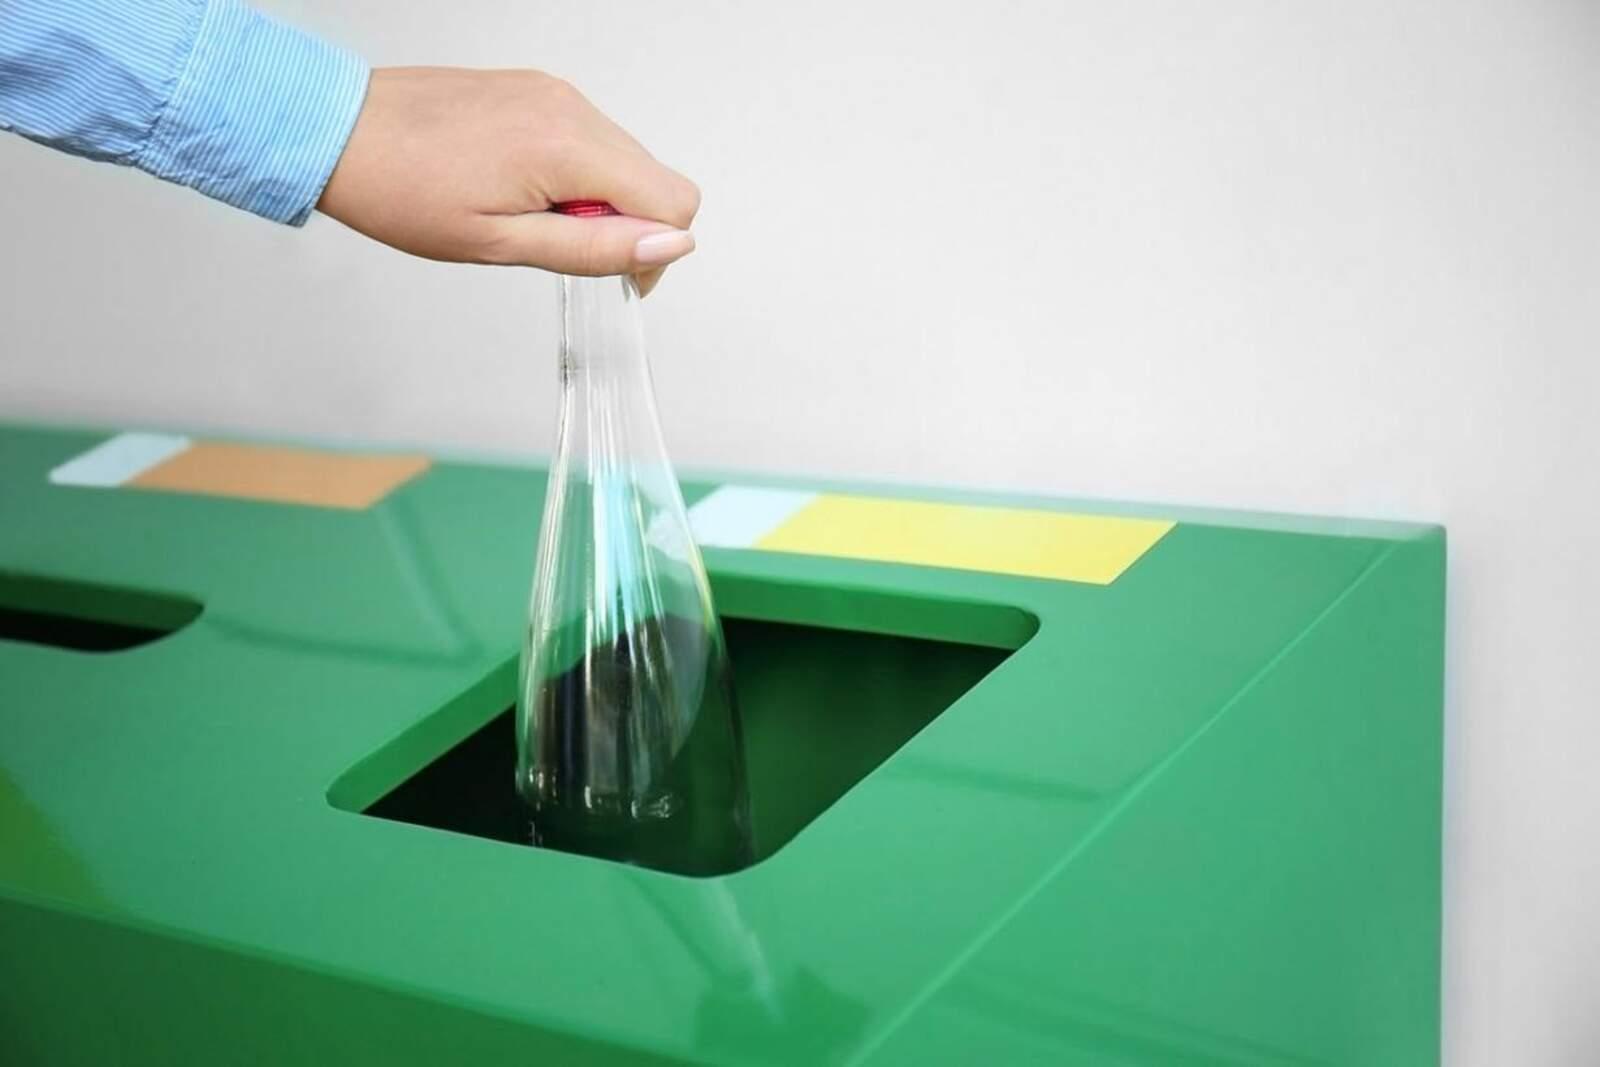 Persona reciclant (foto d'arxiu)